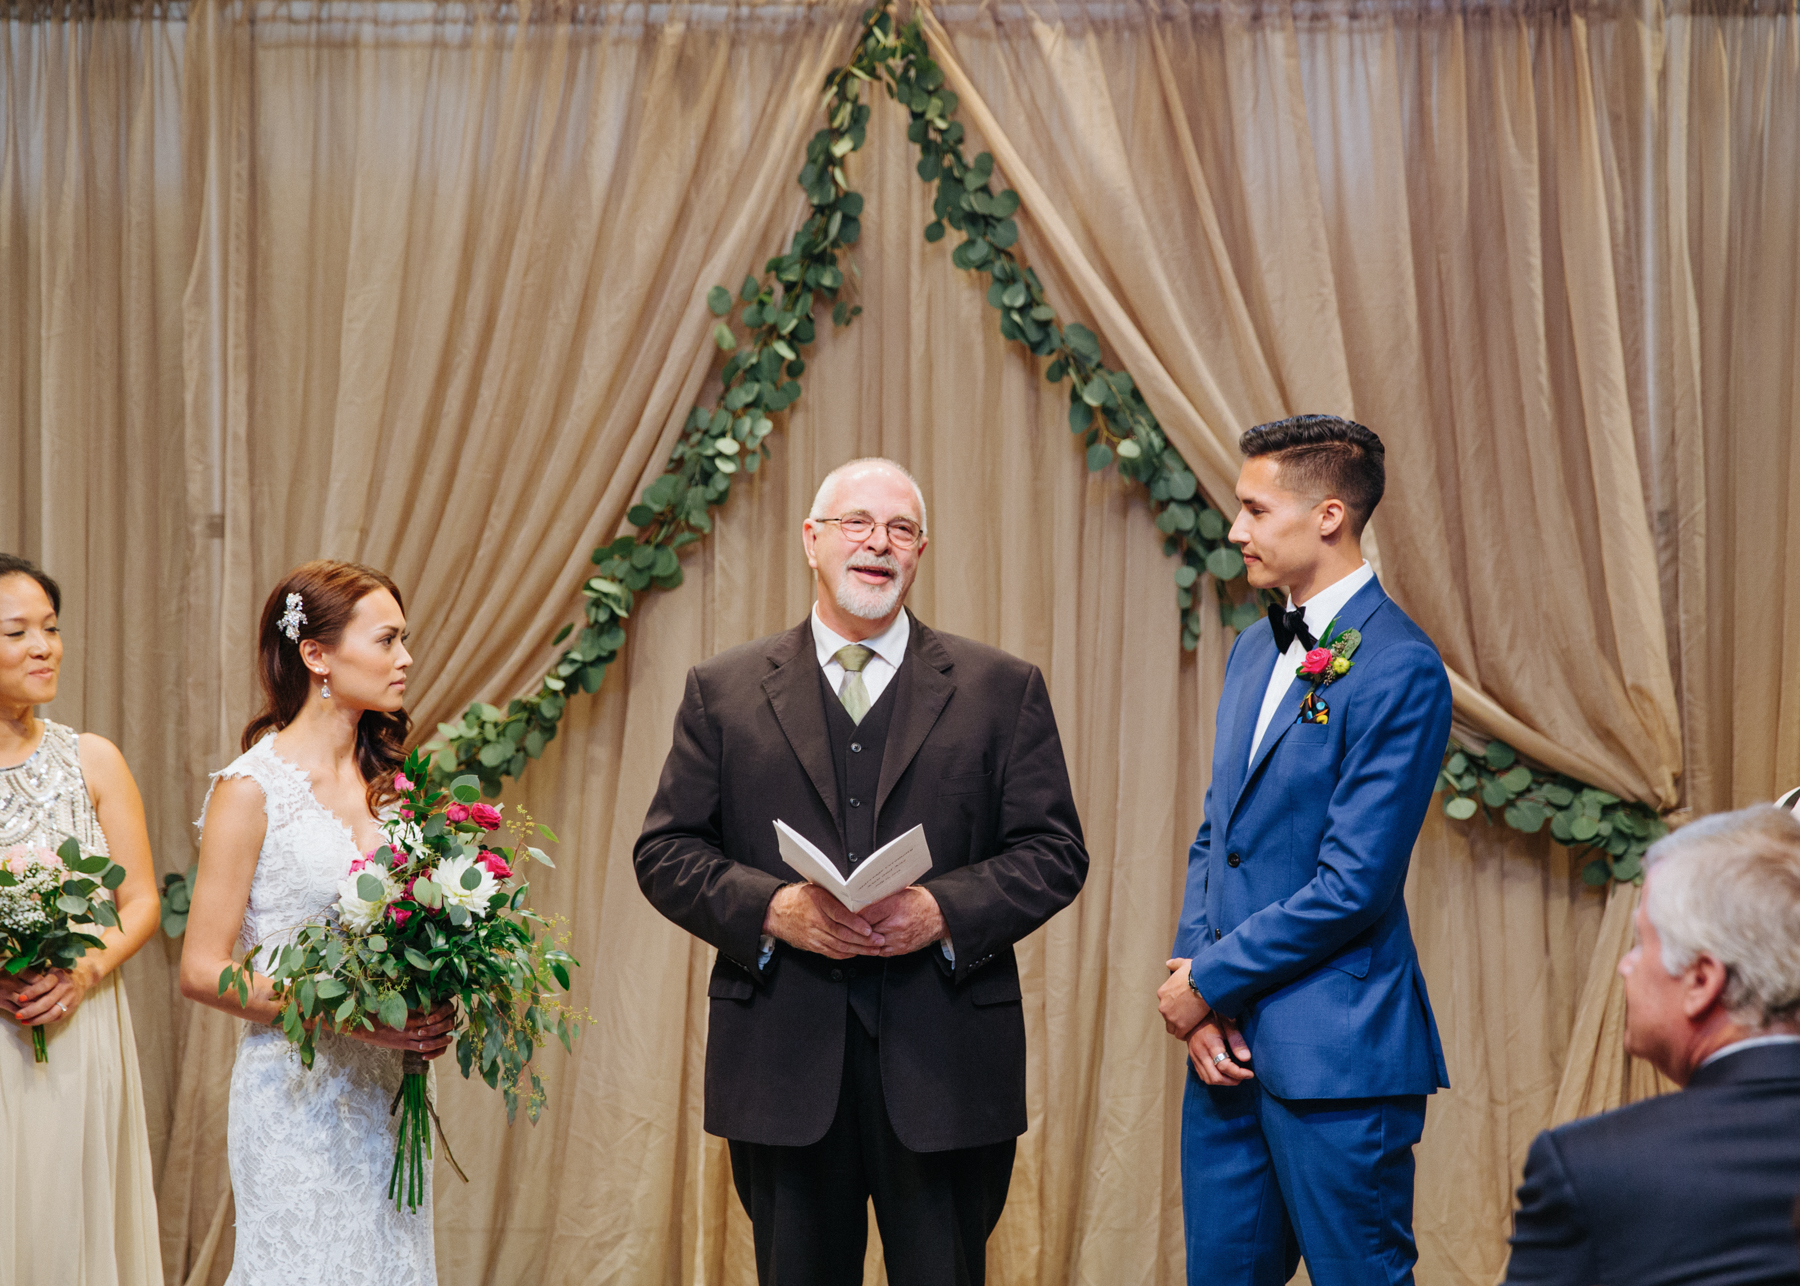 kaoverii_silva_photographer_via-herafilms_kieu_kaz_wedding-10.jpg